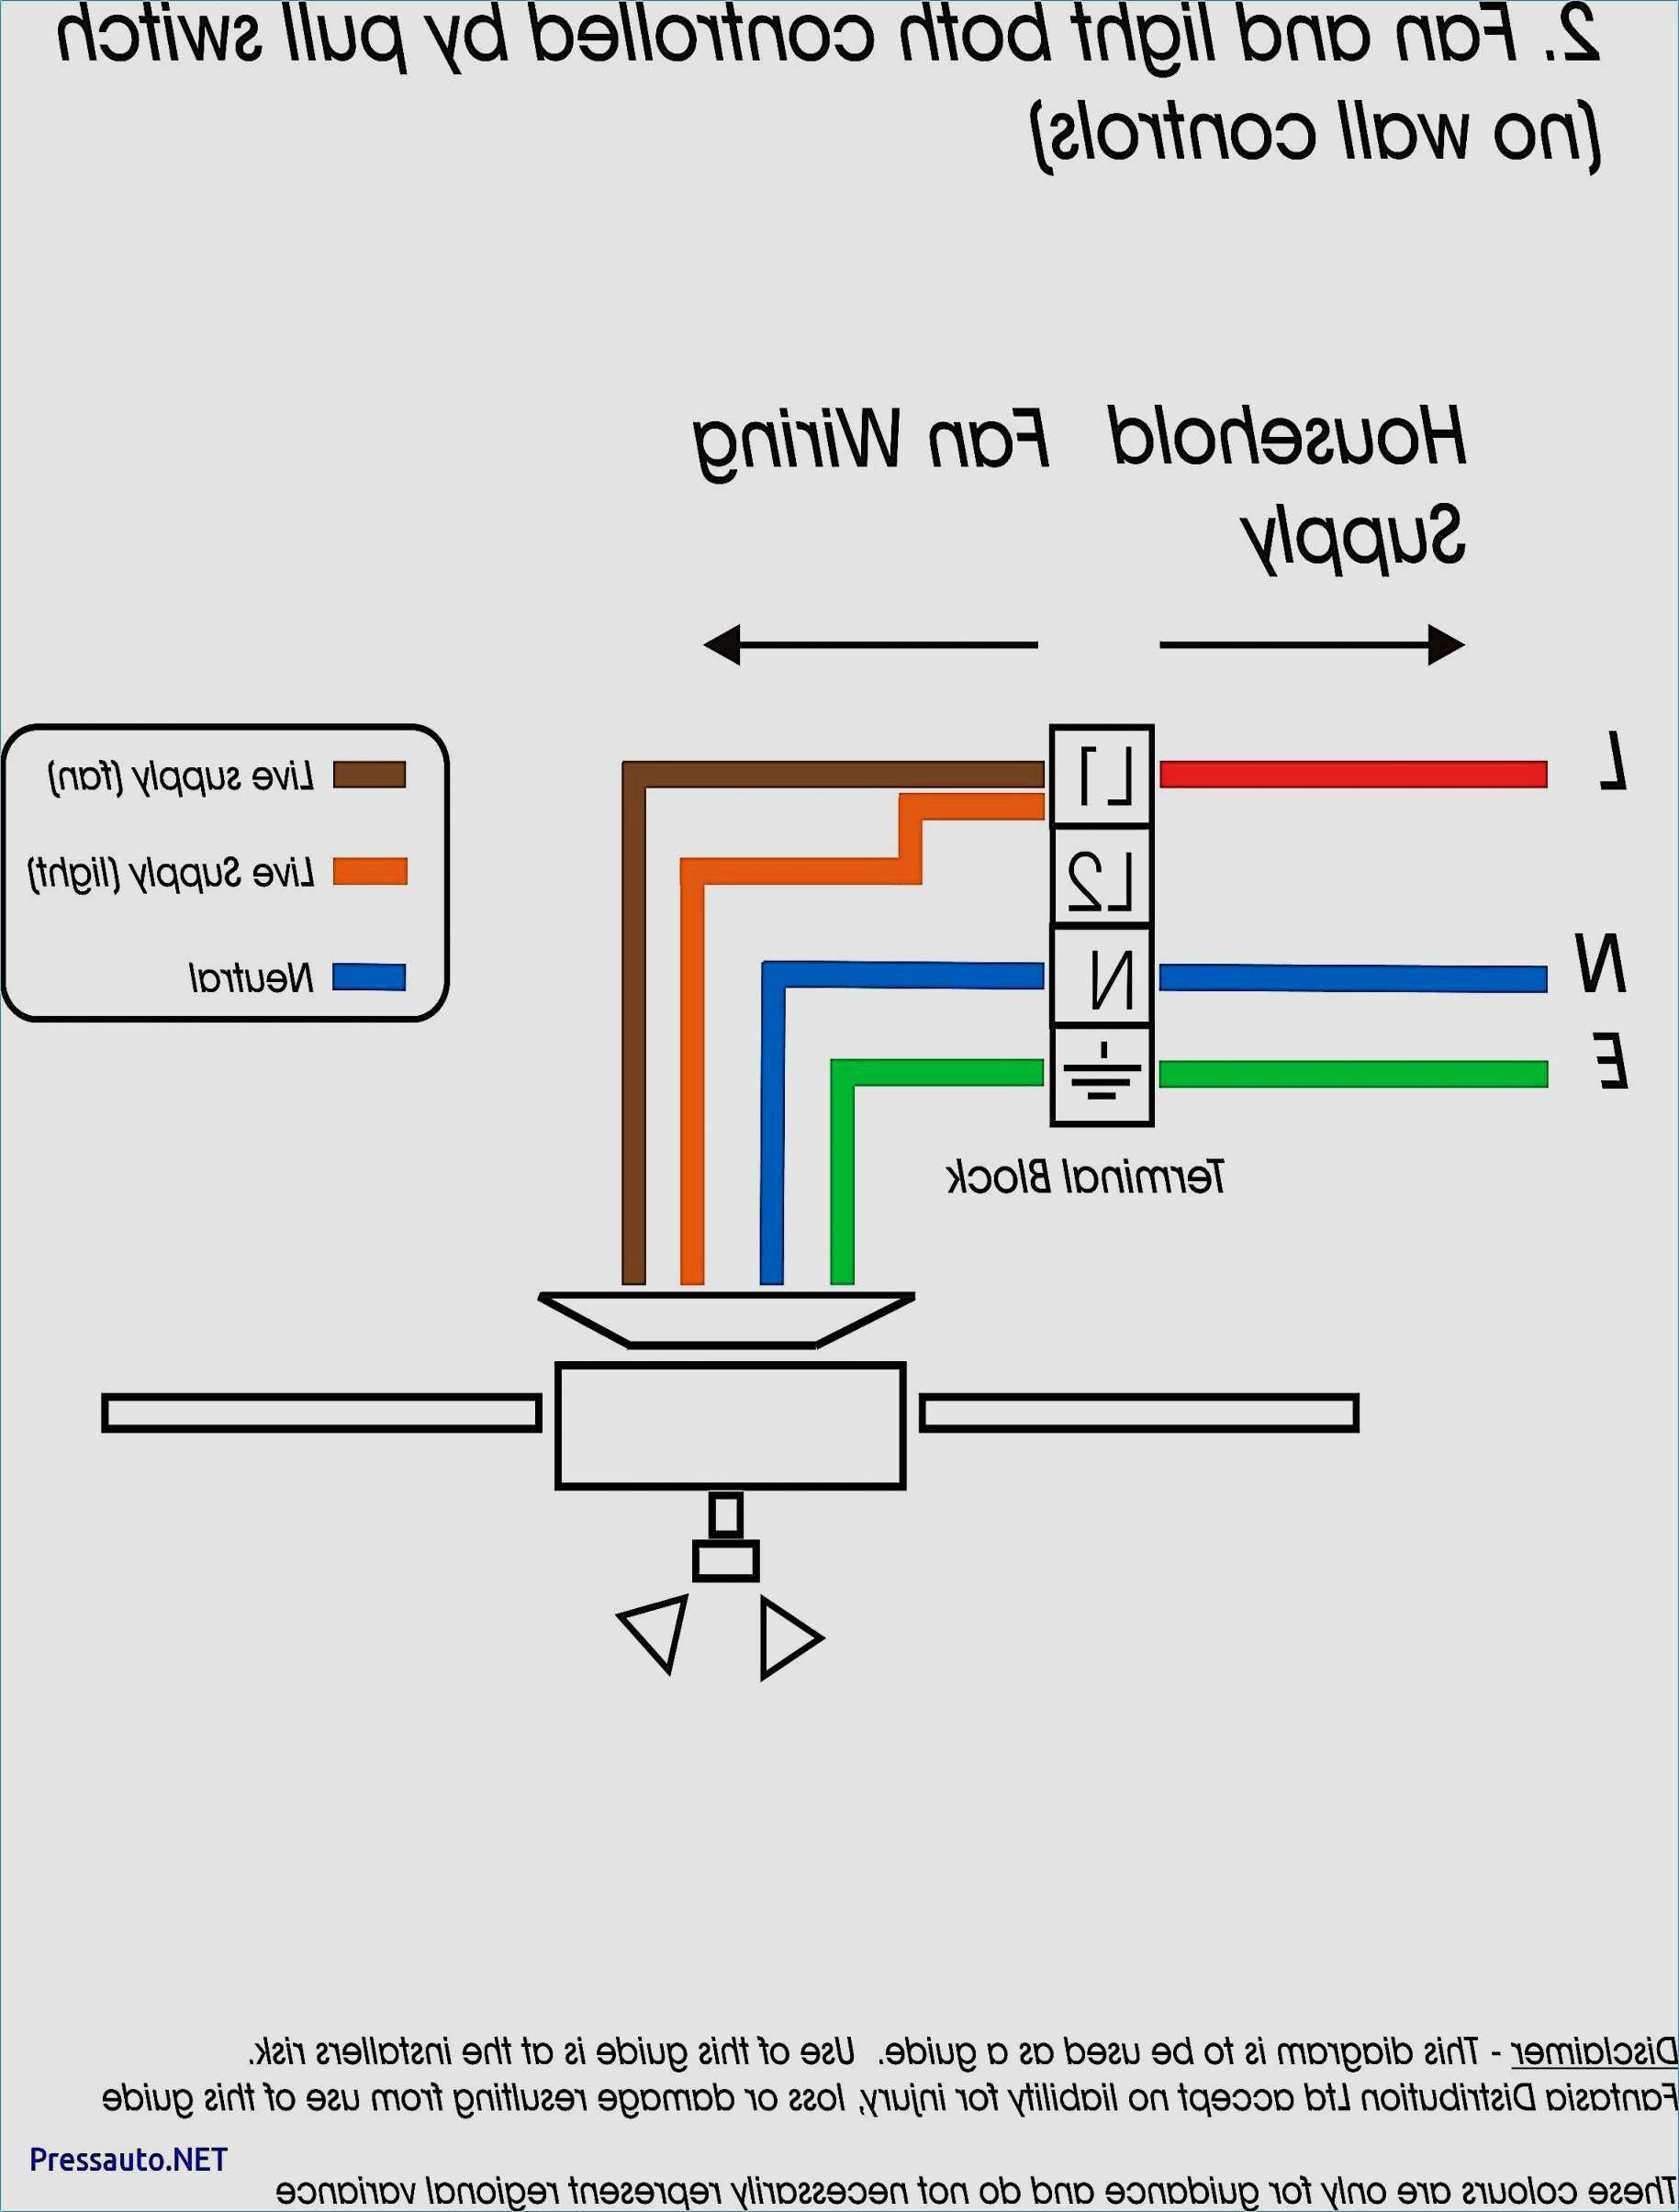 Electric Heat Strip Wiring Diagram Recent Dayton Gas Furnace Wiring - Electric Heat Strip Wiring Diagram